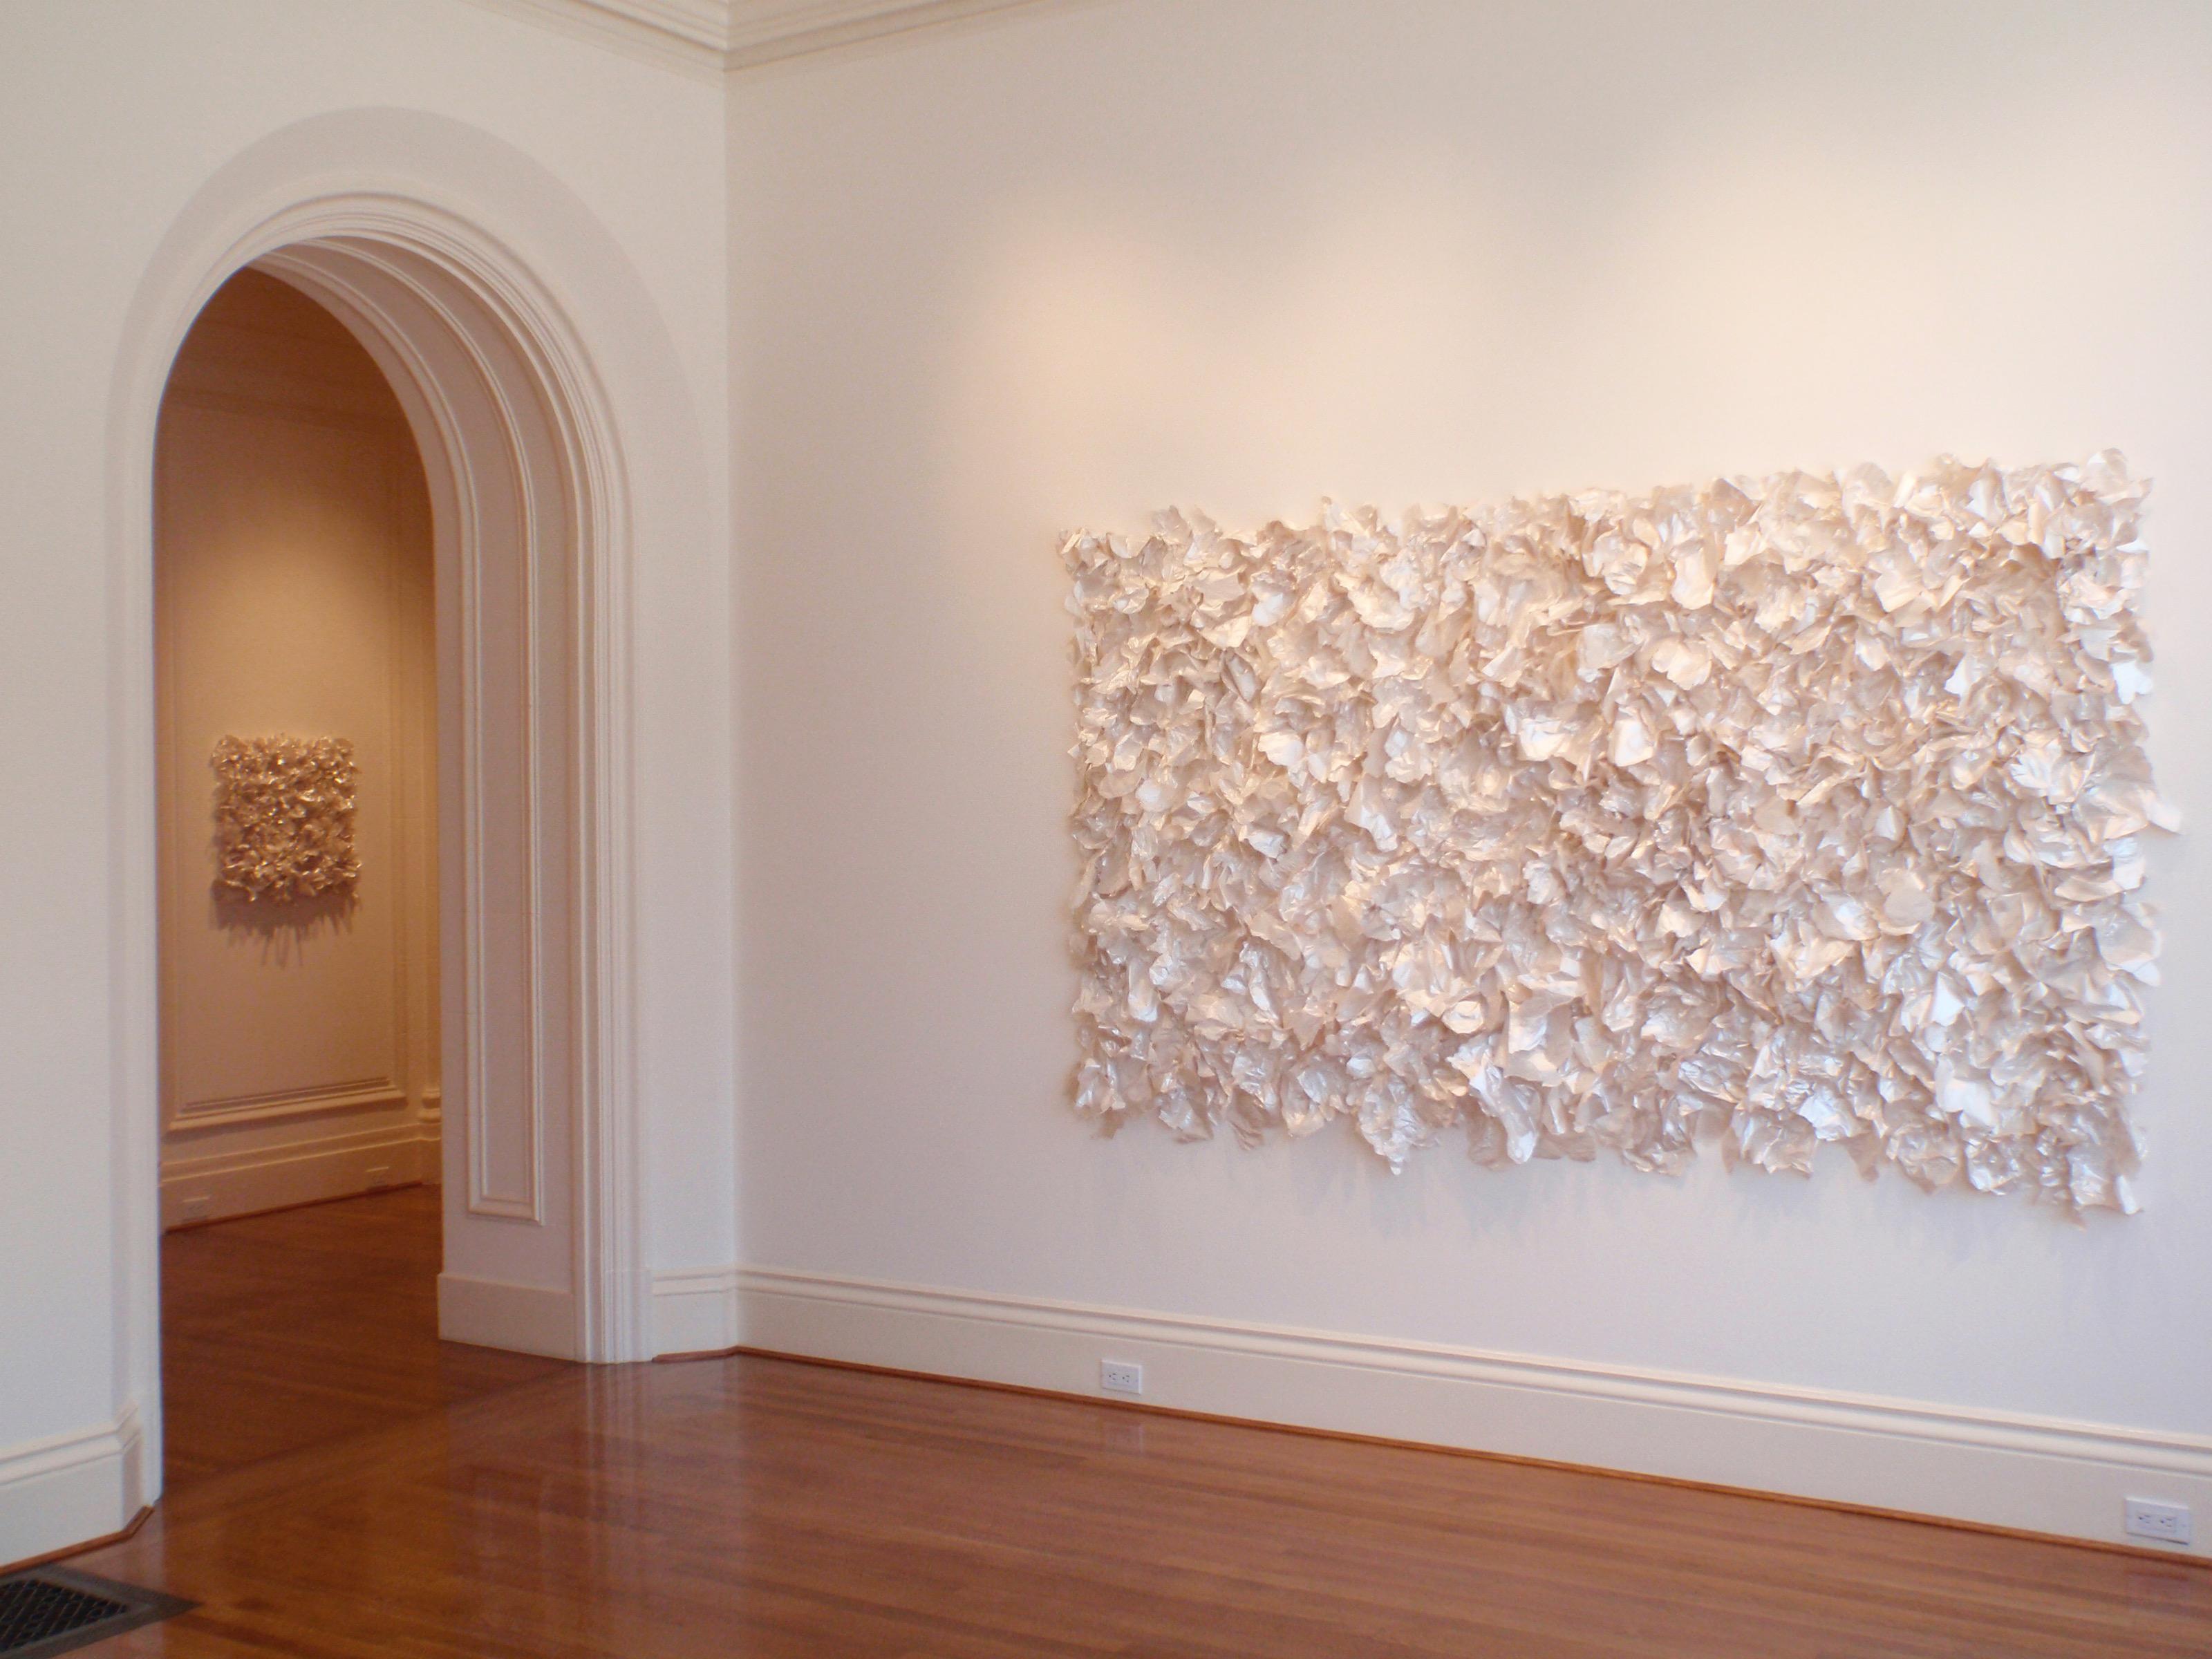 Rosana Castrillo Diaz, Installation View